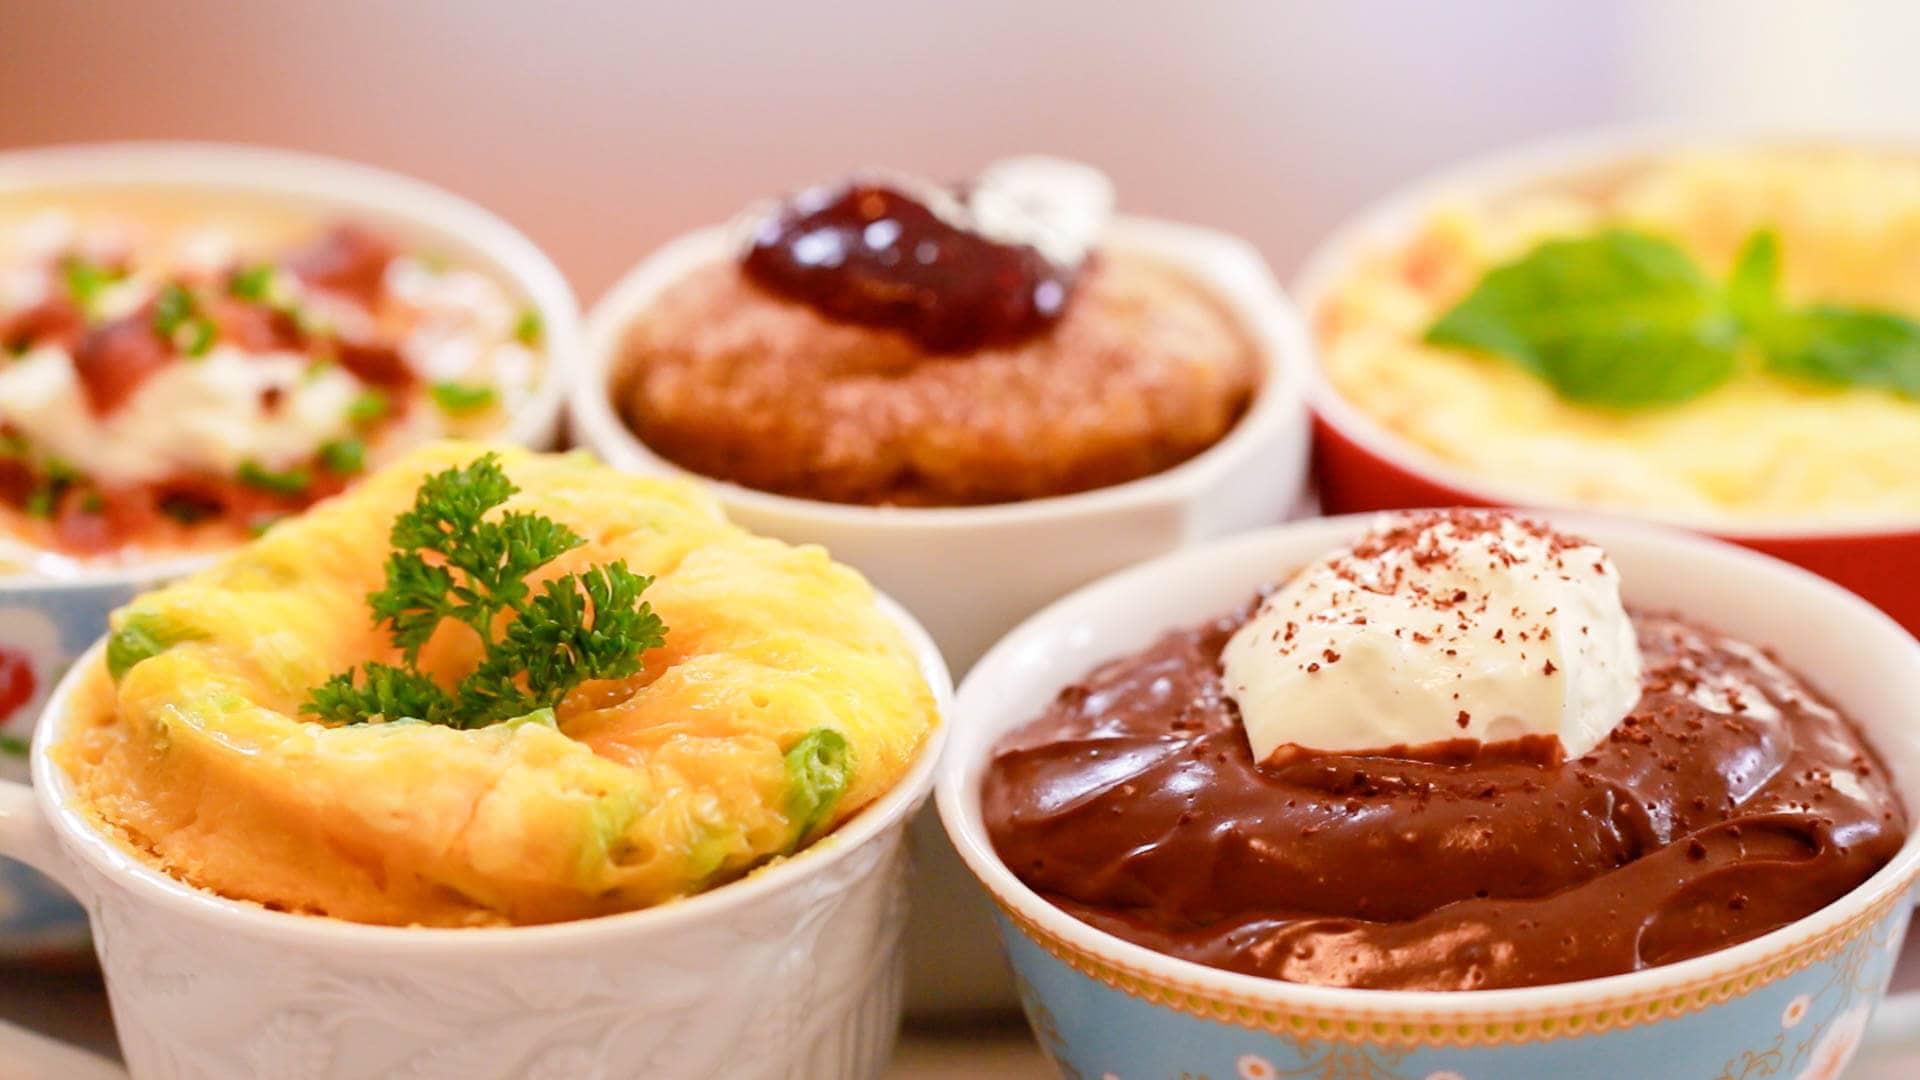 Microwave Mug Meals, Mug Meals, Mug Lasagna, Mug Donut, Mugnut, Egg MugMuffin, Mug Pudding, Chocolate Pudding, Gemma Stafford, Bigger Bolder Baking